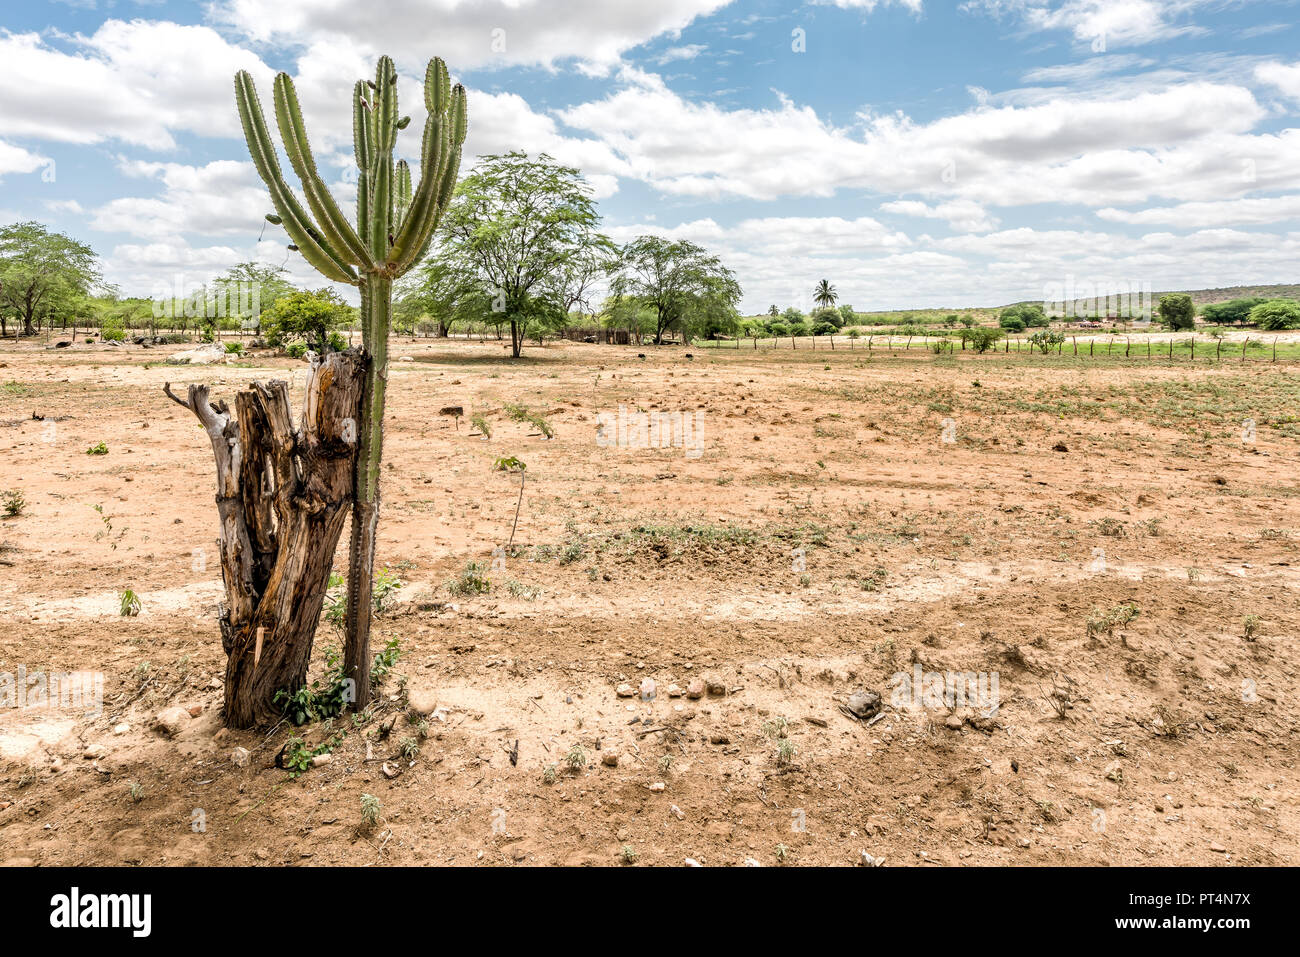 São Domingos do Cariri, Paraiba, Brazil - February, 2018: Landscape of Caatinga Biome with Mandacaru cactus at Northeast of Brazil - Stock Image